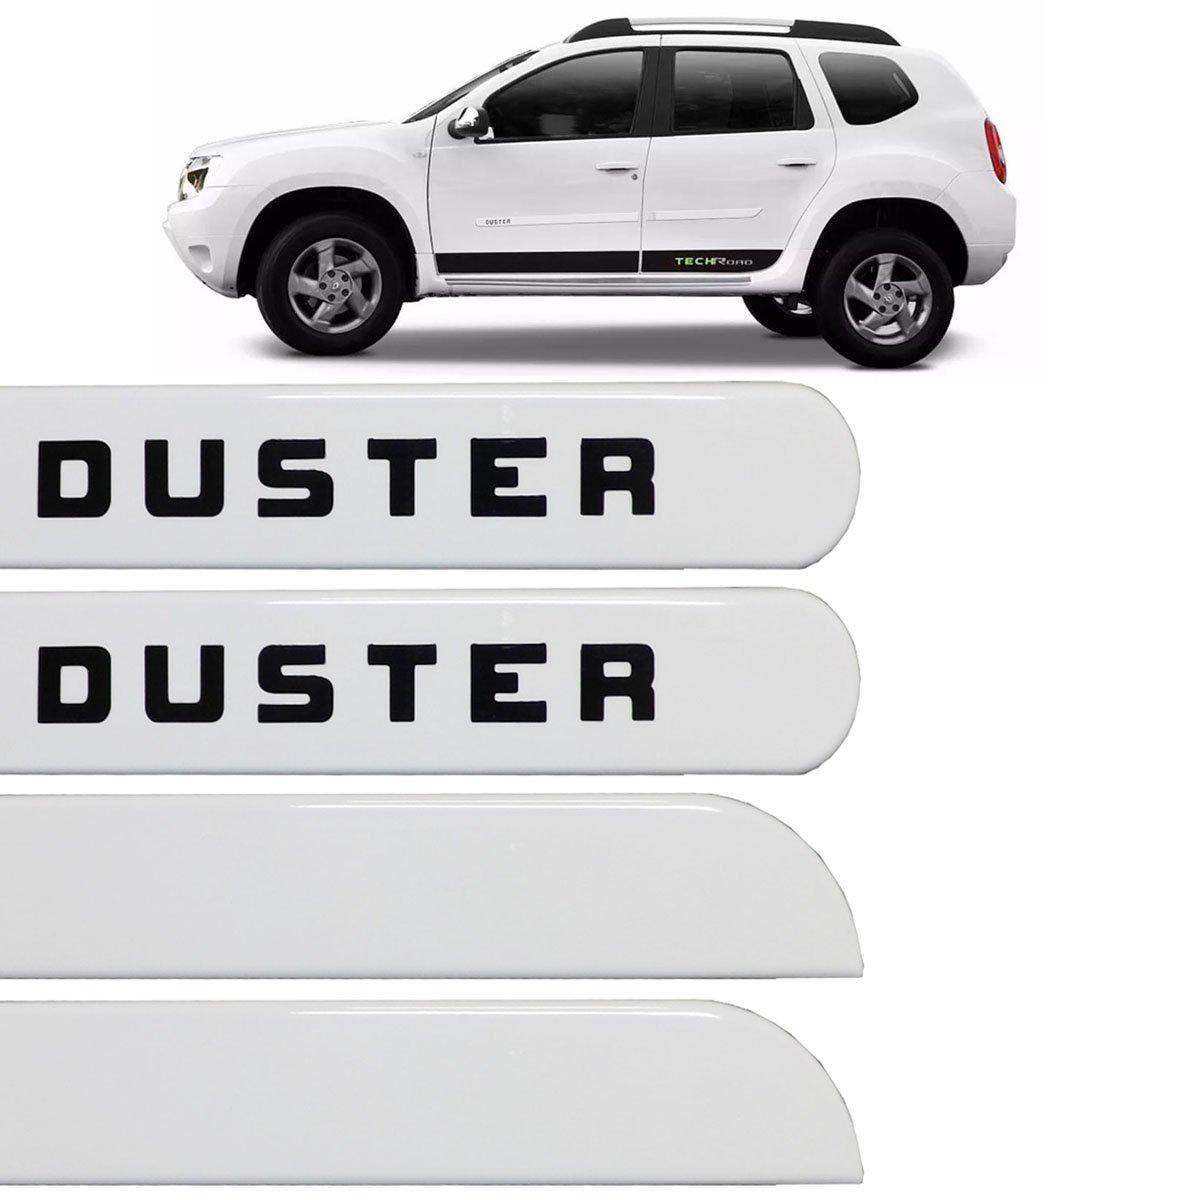 Jogo Friso Lateral Duster 2010 até 2016 Branco Niege